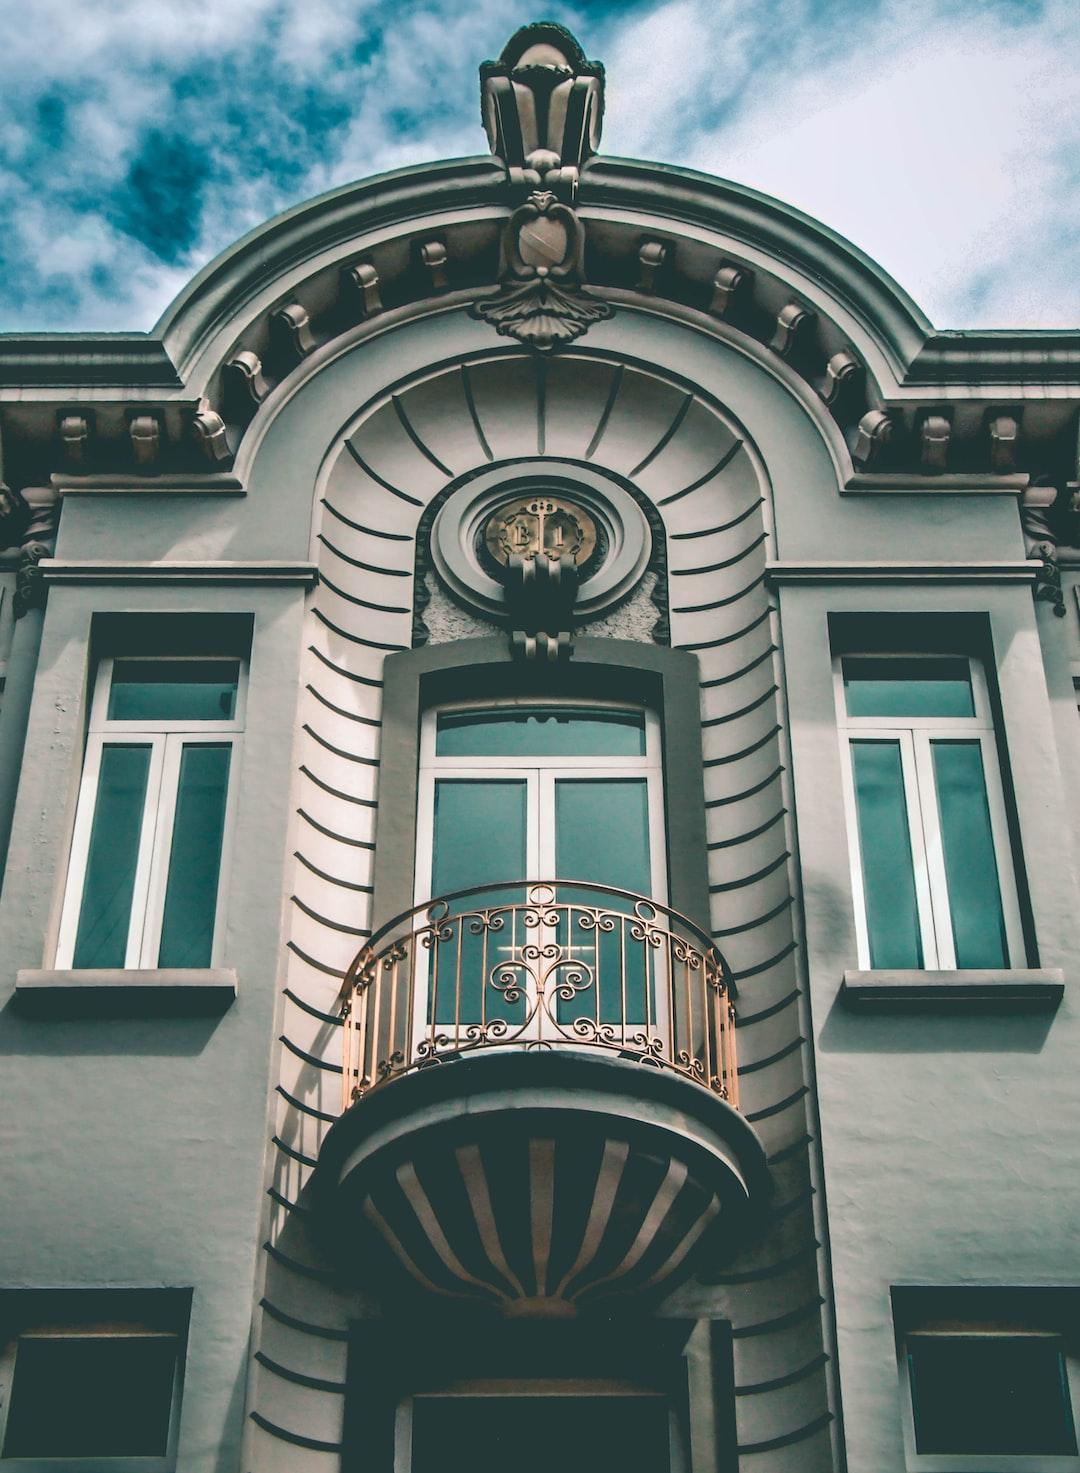 Arquitectura Neoclásico Cuenca-Ecuador #ecuador #architecture